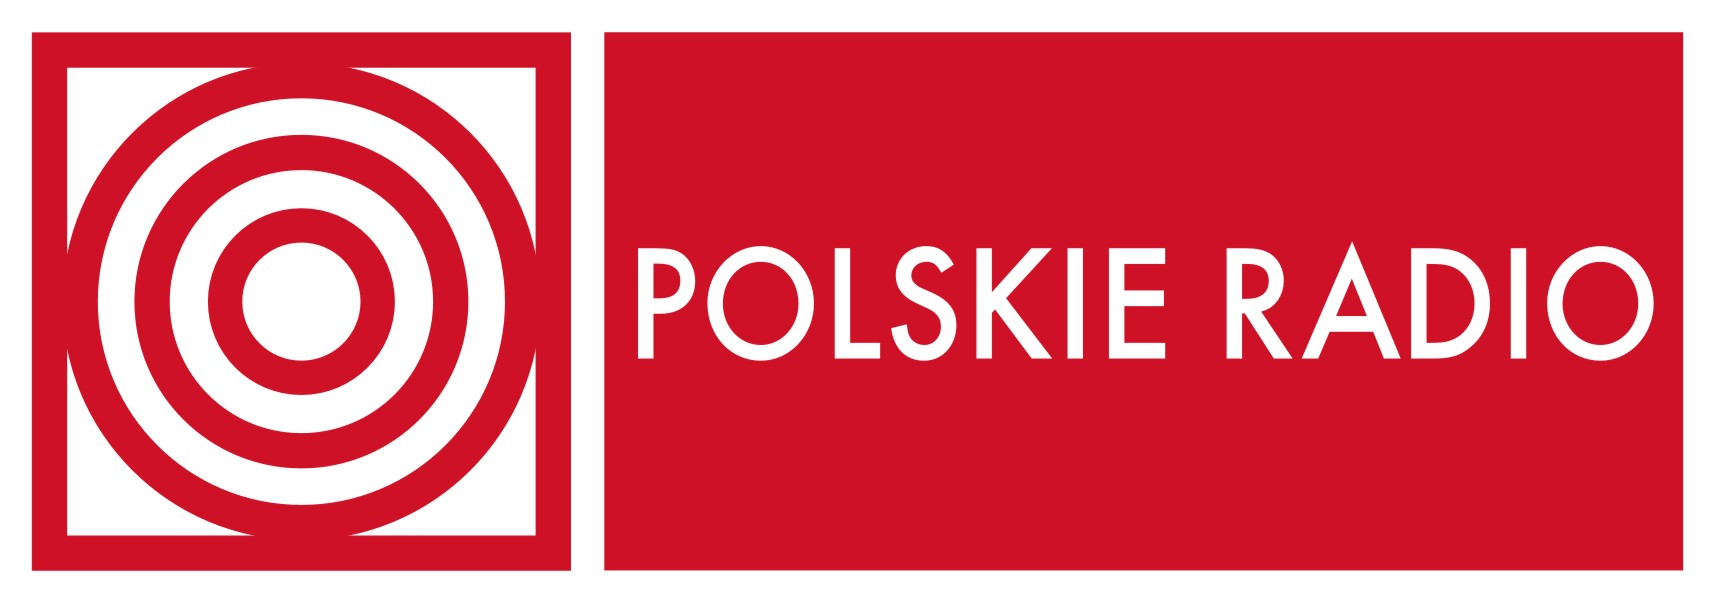 polskie_radio_1